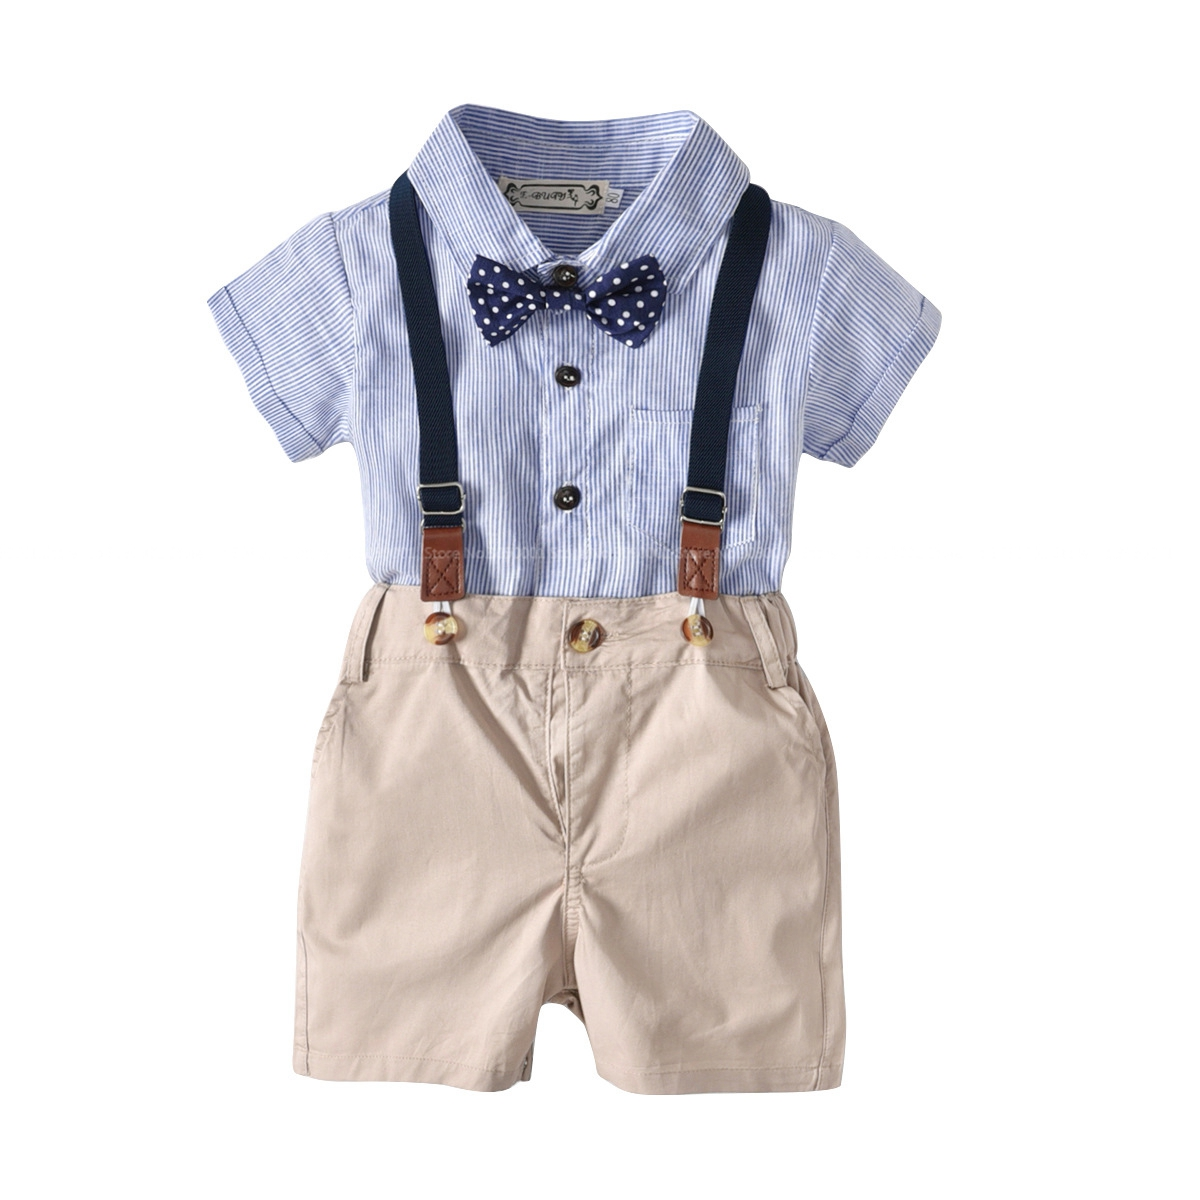 ed6c01d79c6d2 2018 New Summer Infant Boys Baby Boy Clothing Set Clothes Tie Shirts+ Overalls 2PCS Outfit Sets bebes Gentlemen Suit for Party